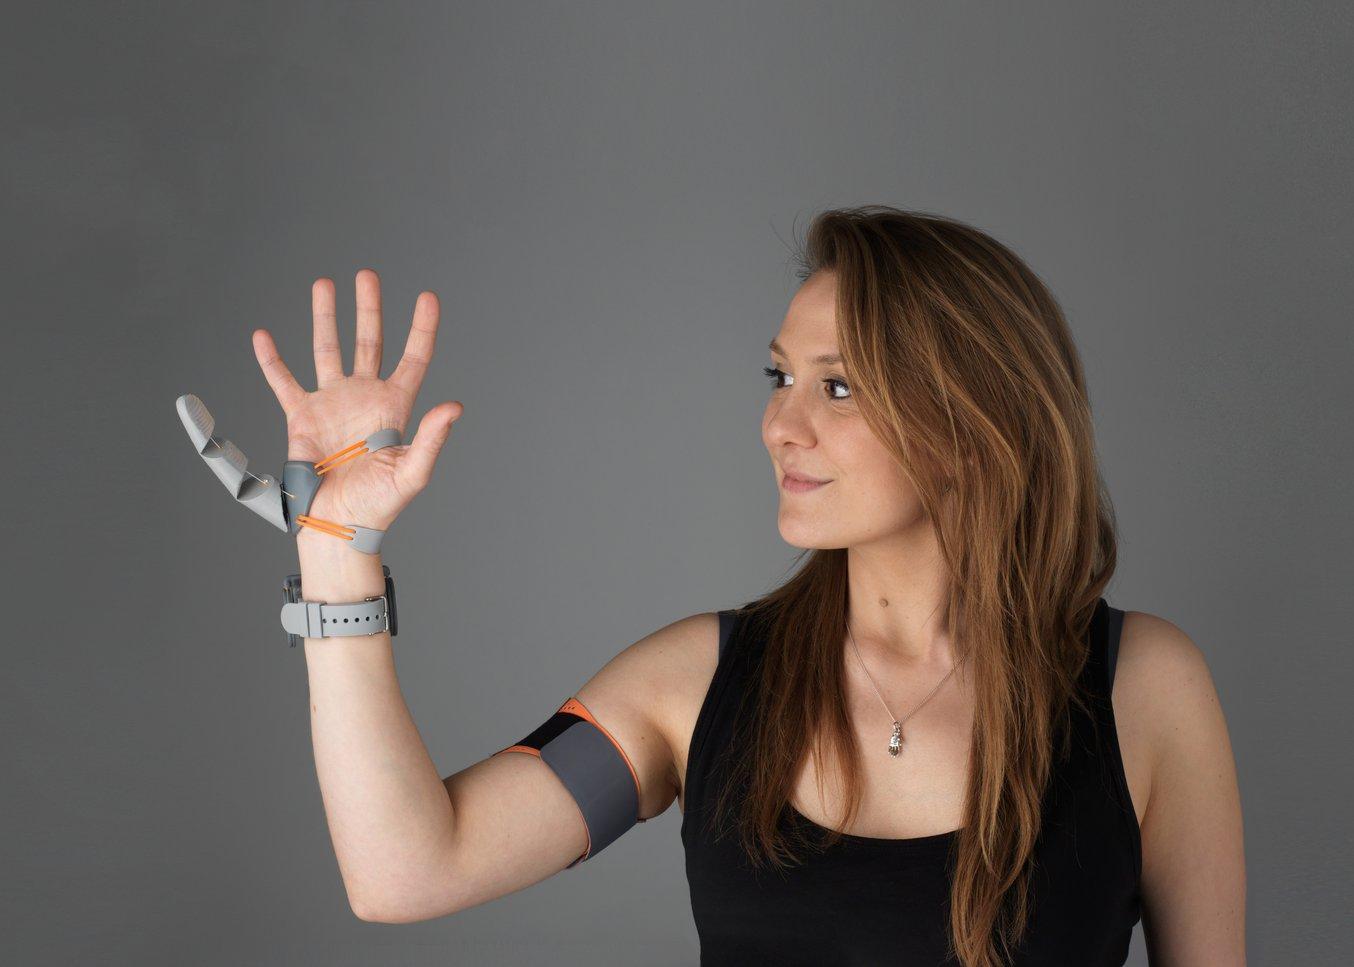 Dani Clode wearing the third thumb.